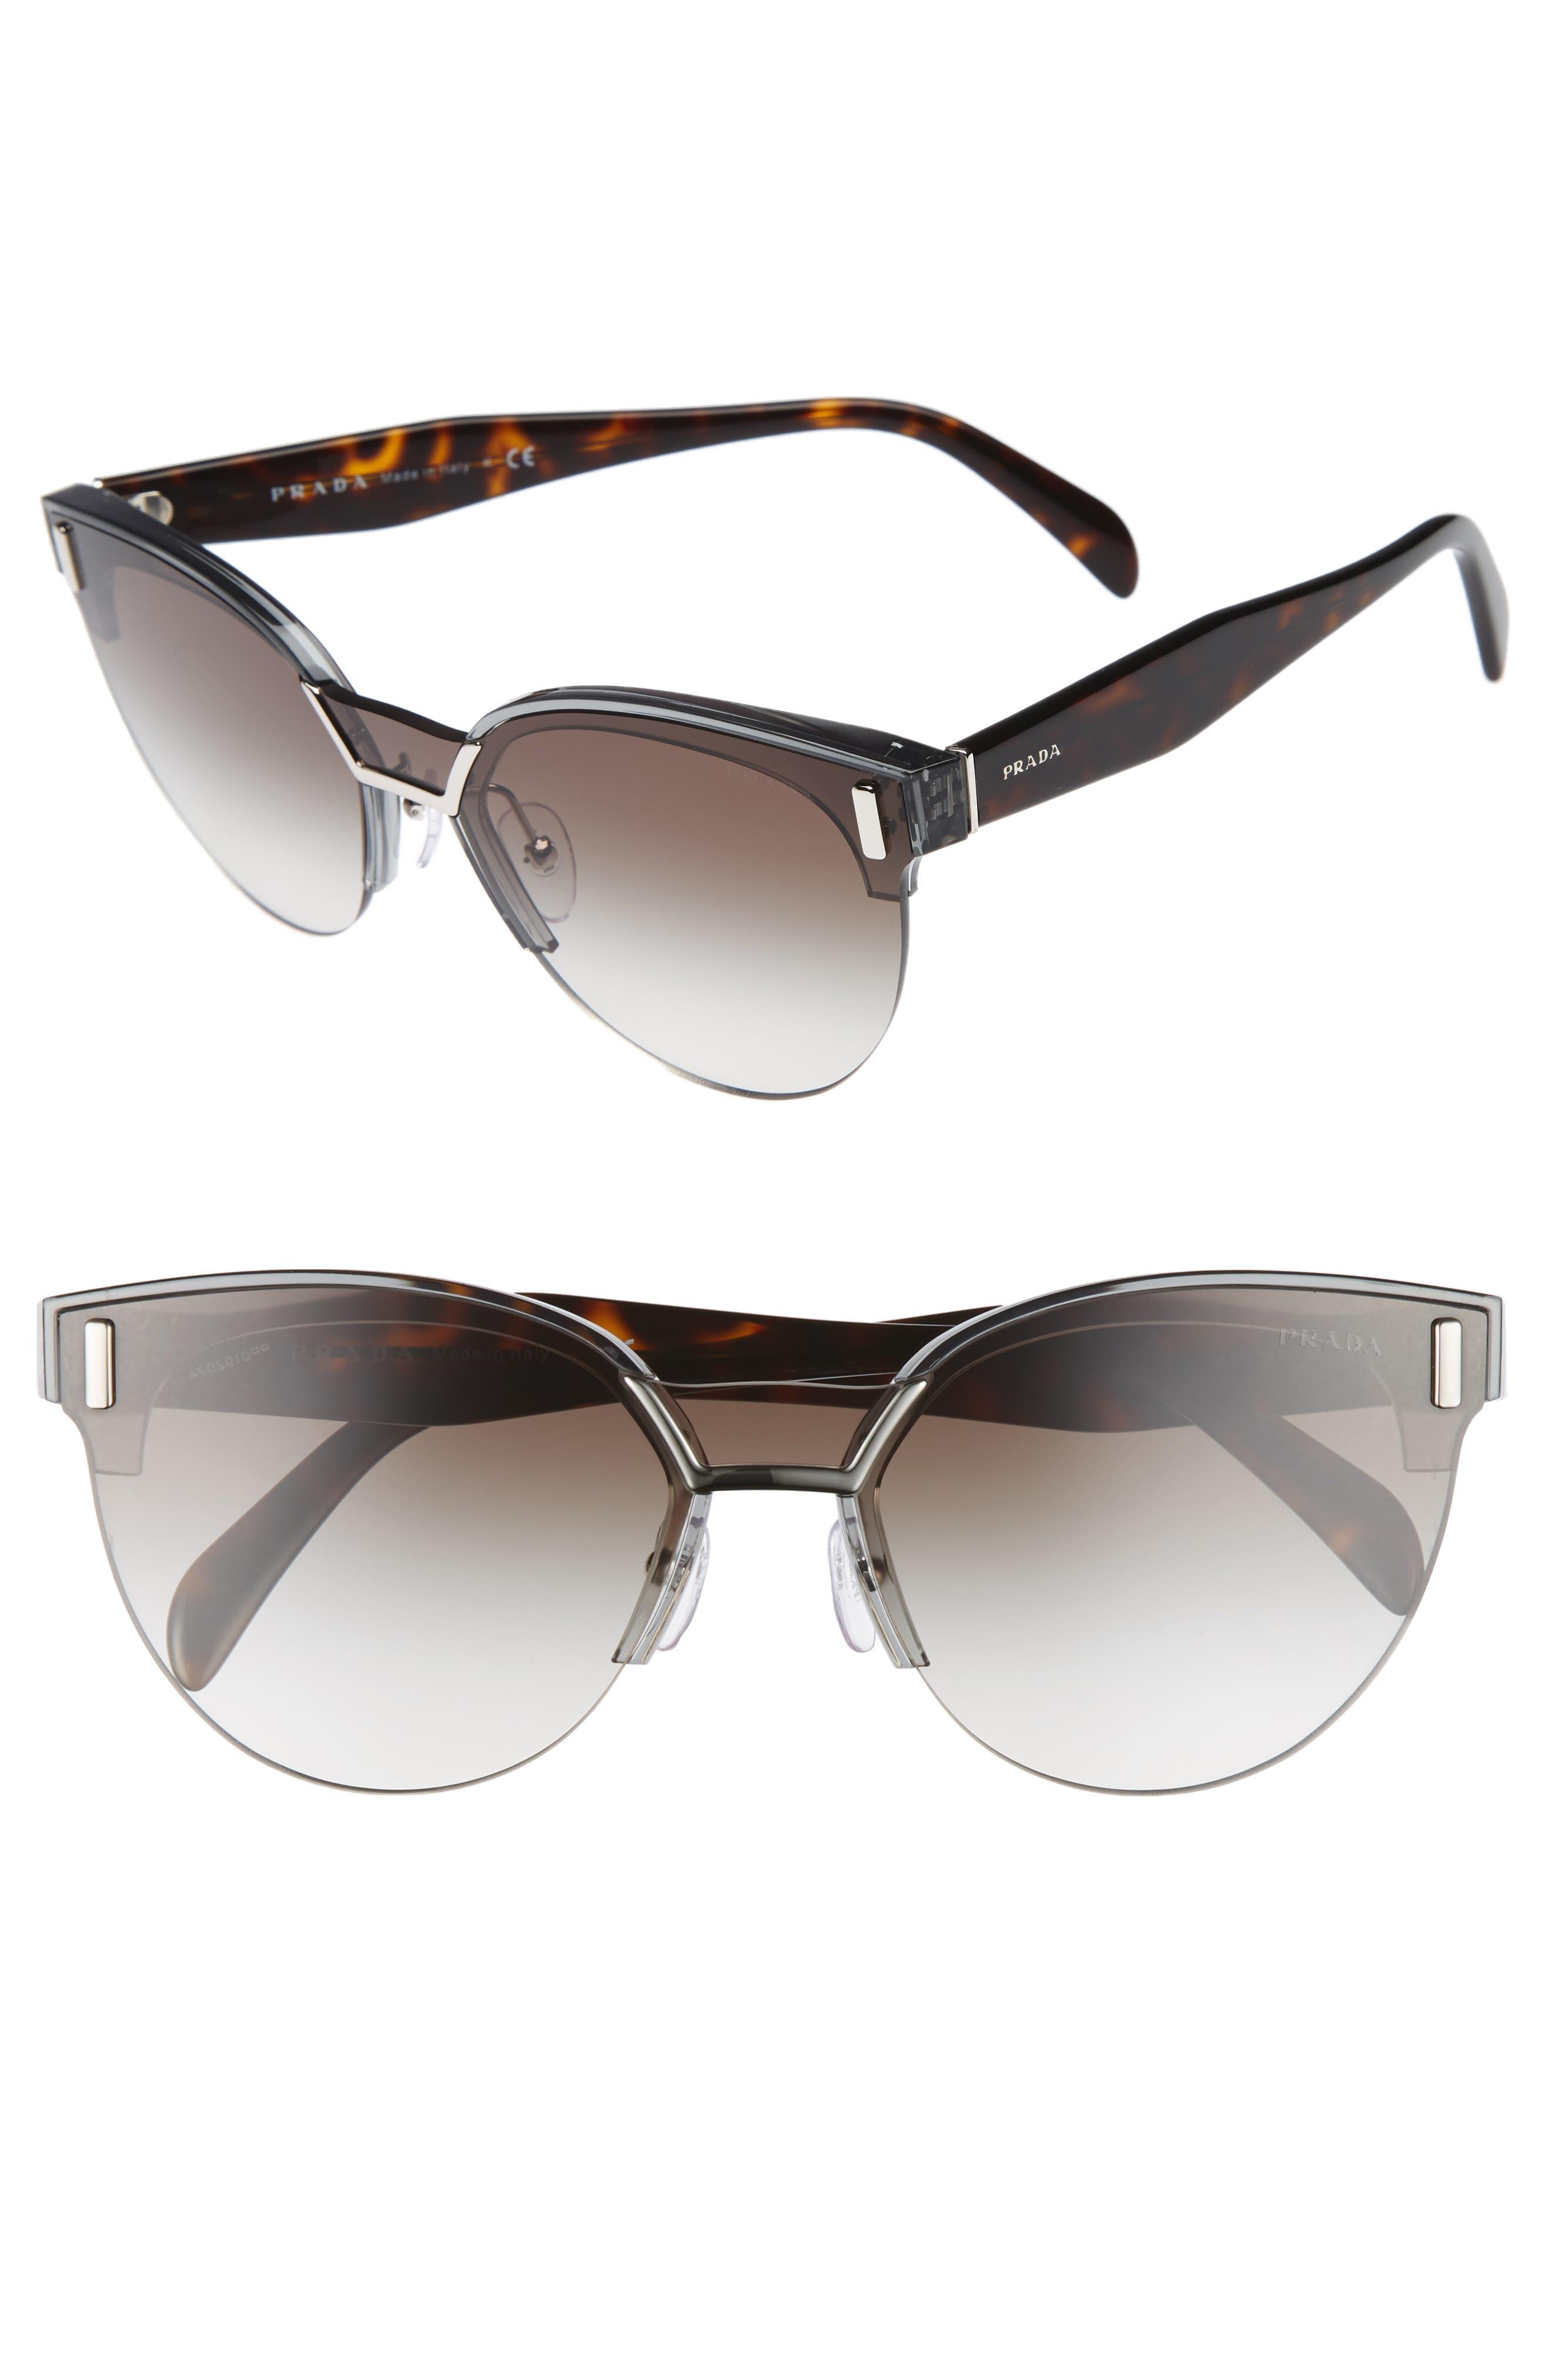 50mm Semi Rimless Gradient Sunglasses,                         Main,                         color,